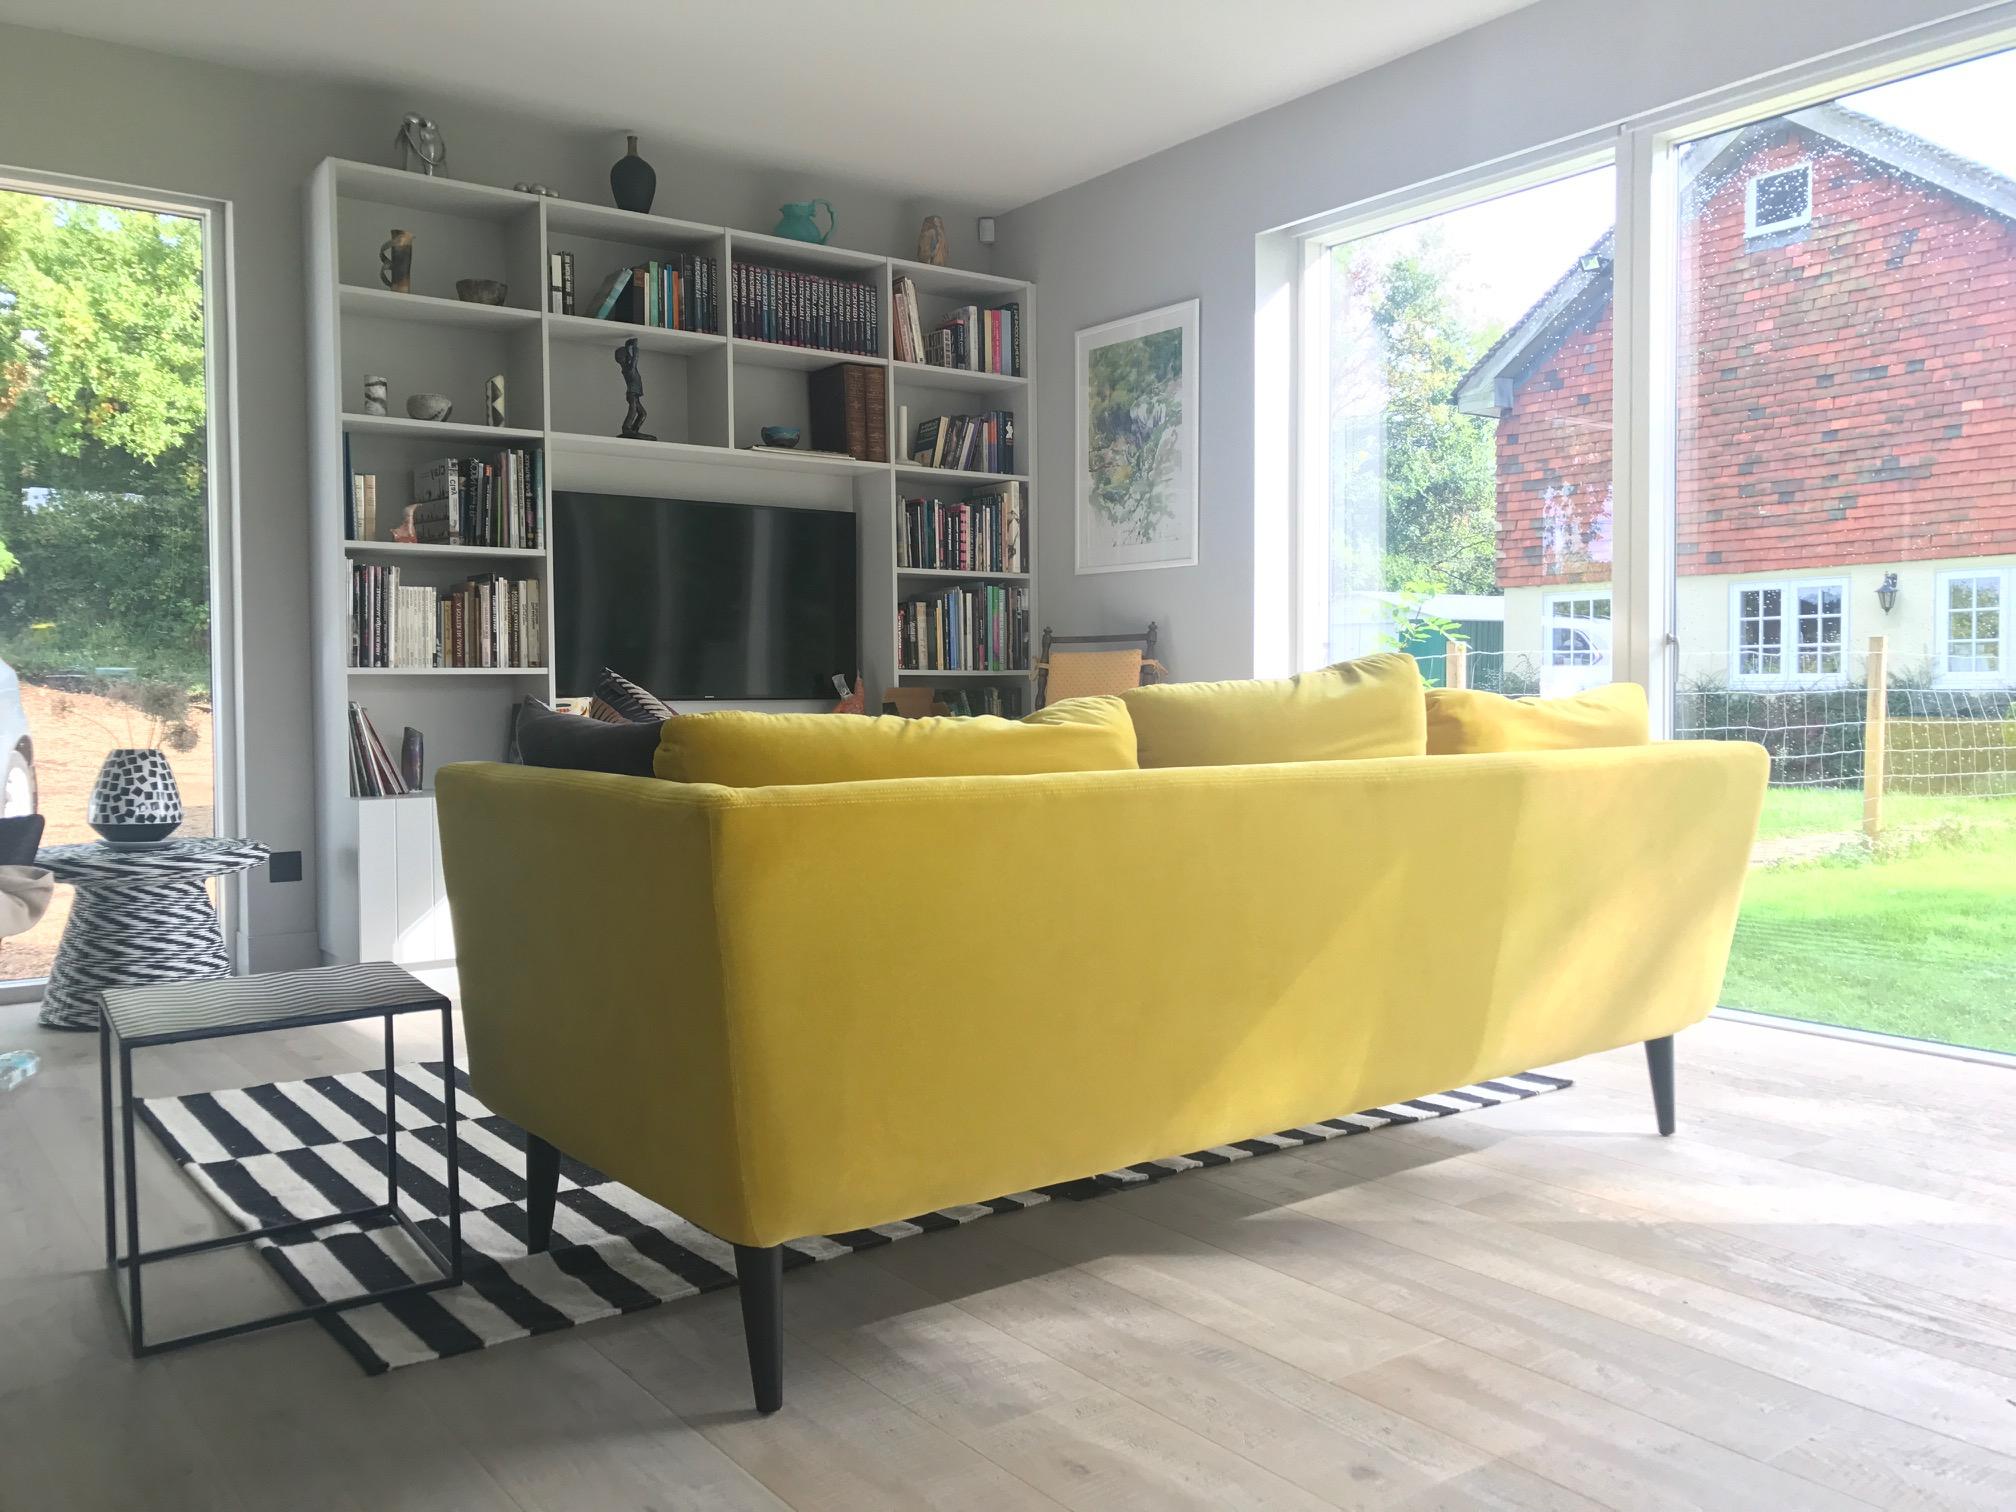 Sofa Com Gdd0 Yellow sofa Holly sofa From Rear sophie Robinson